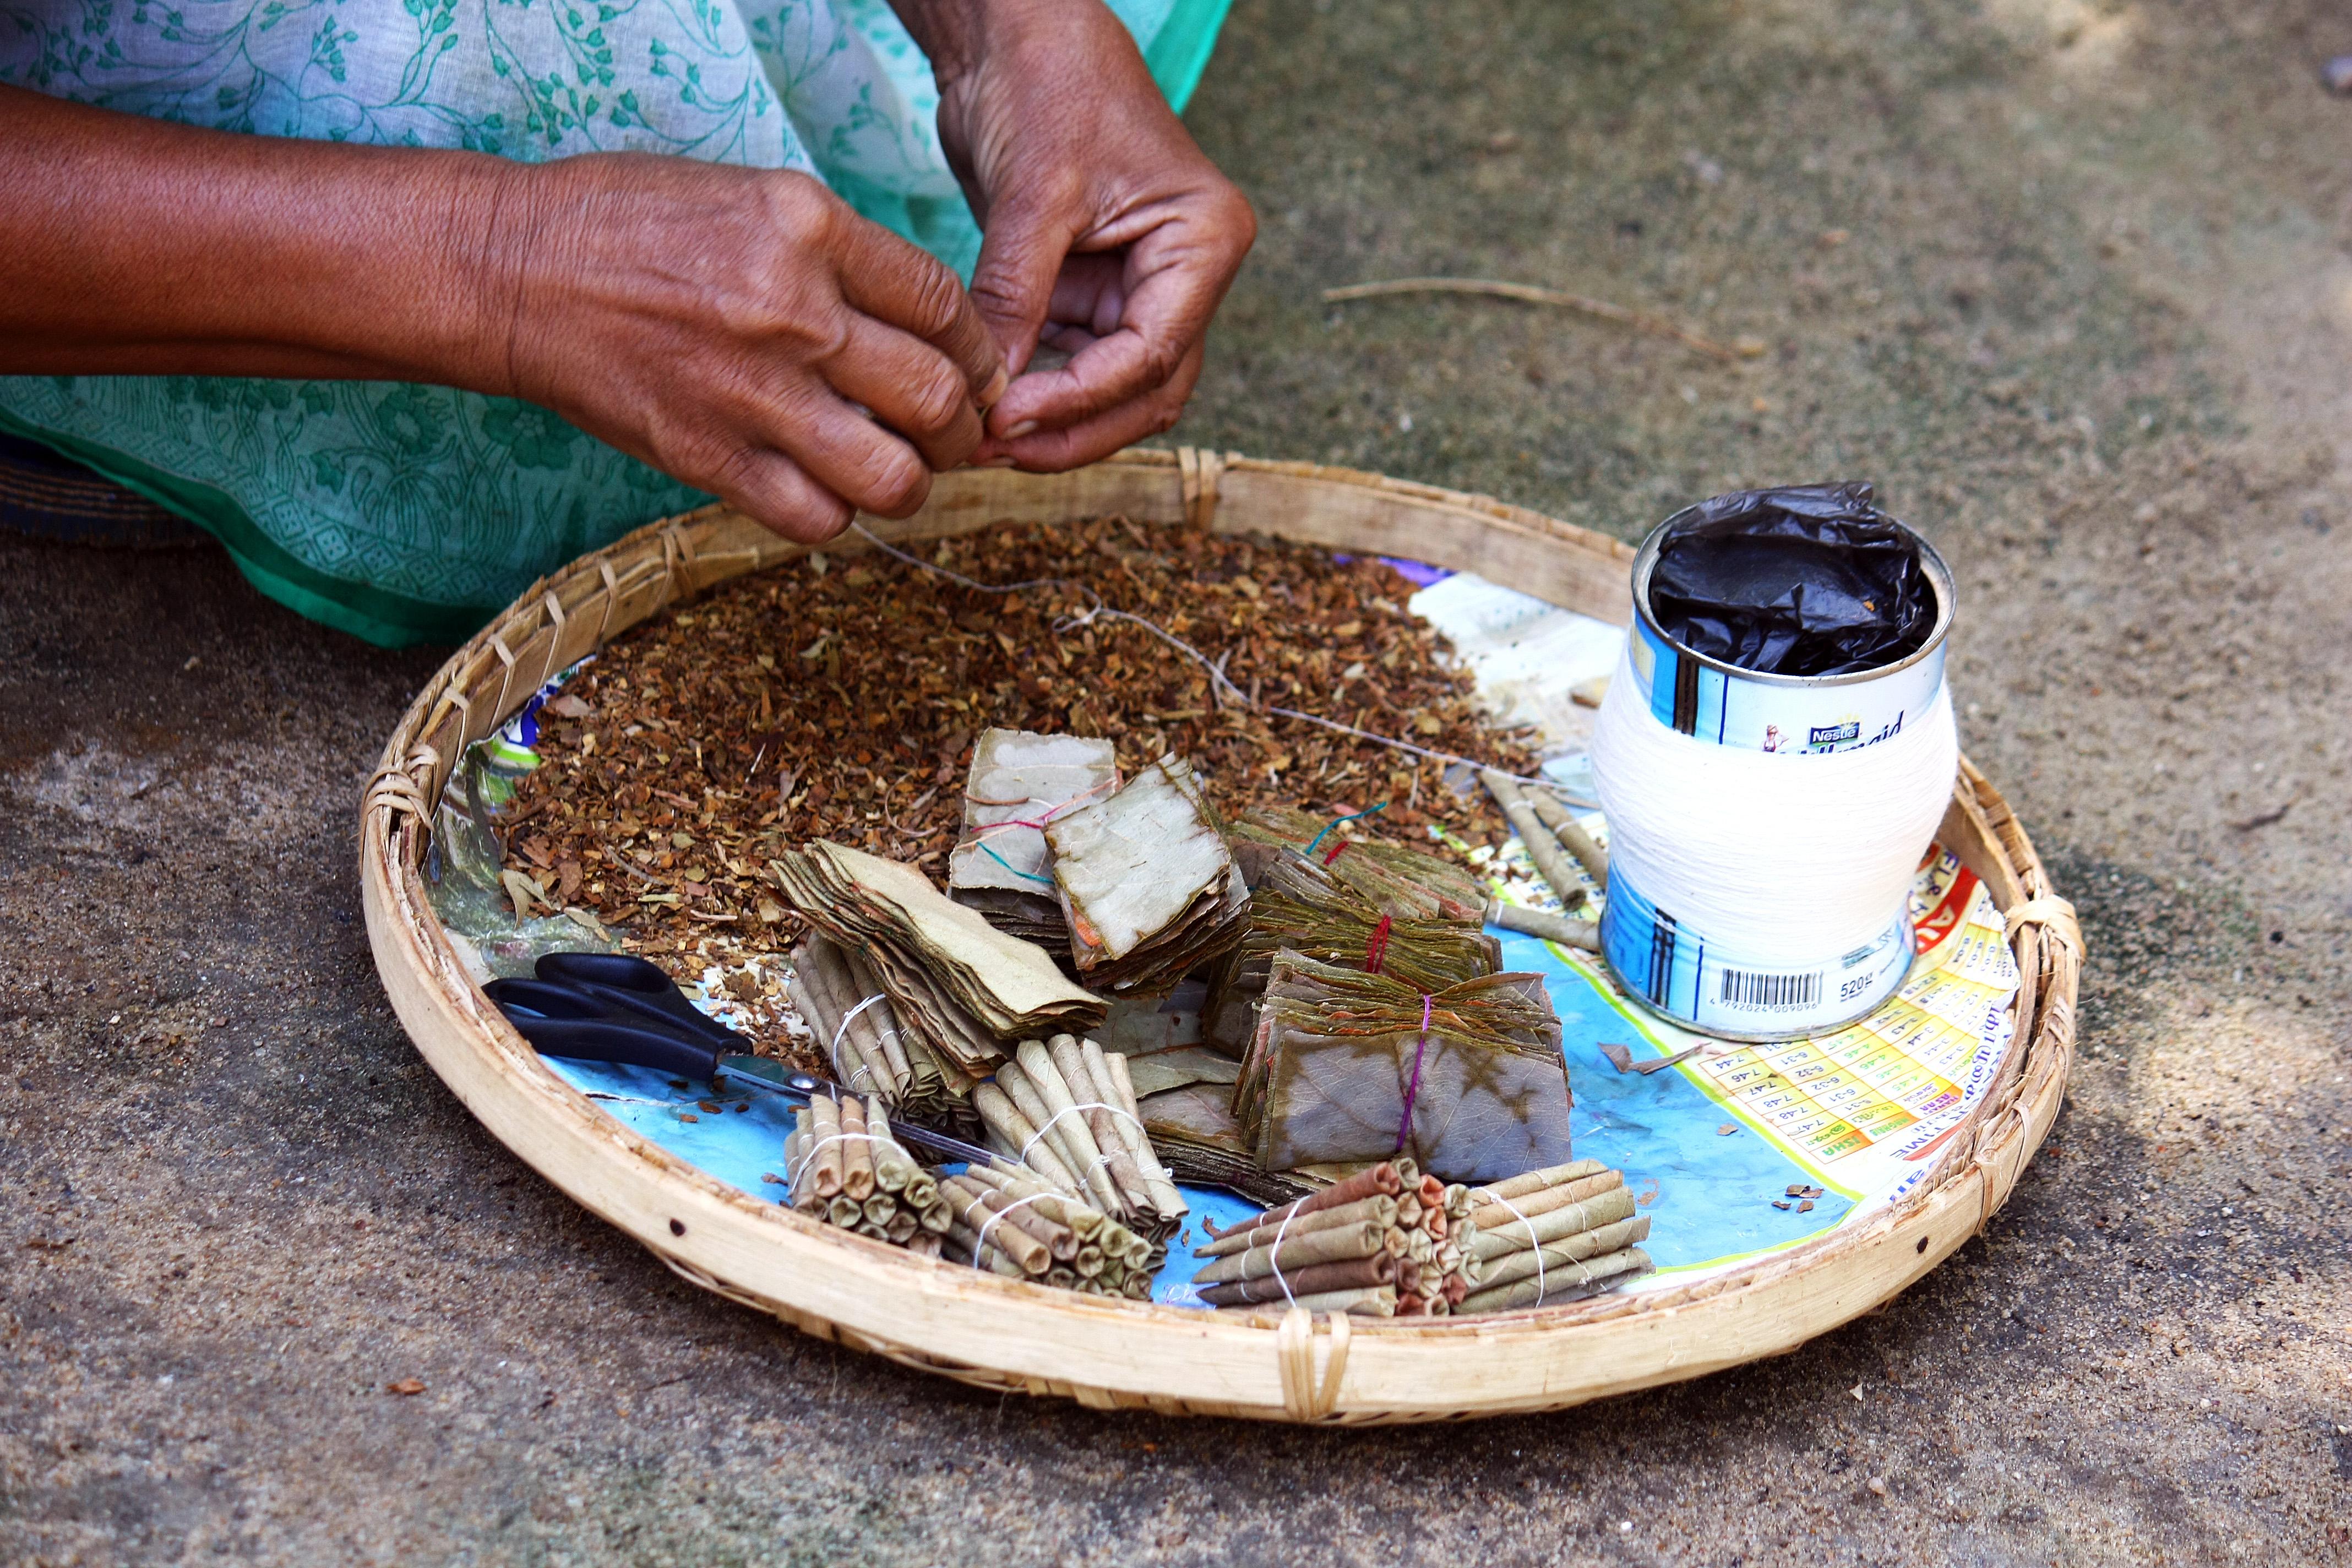 File:Beedi making as handicraft.jpg - Wikimedia Commons